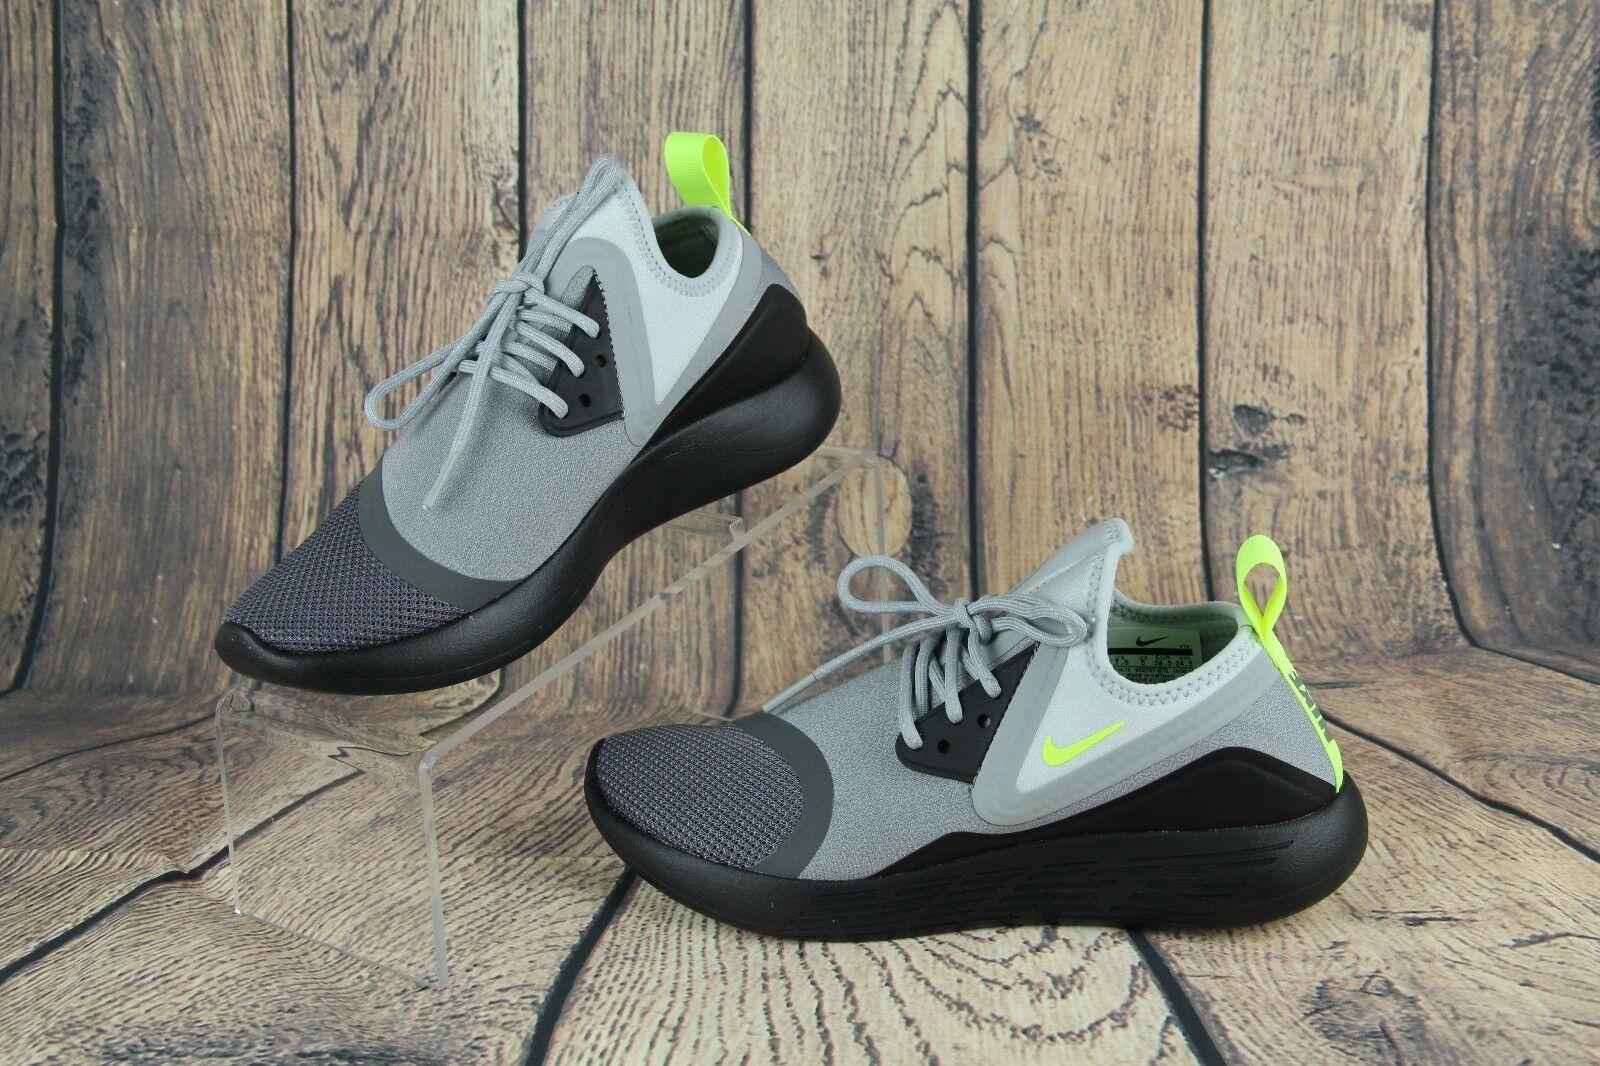 Nike Lunarcharge BN Air Max 95 OG Gray Black Volt 933797-070 Womens Size 7.5